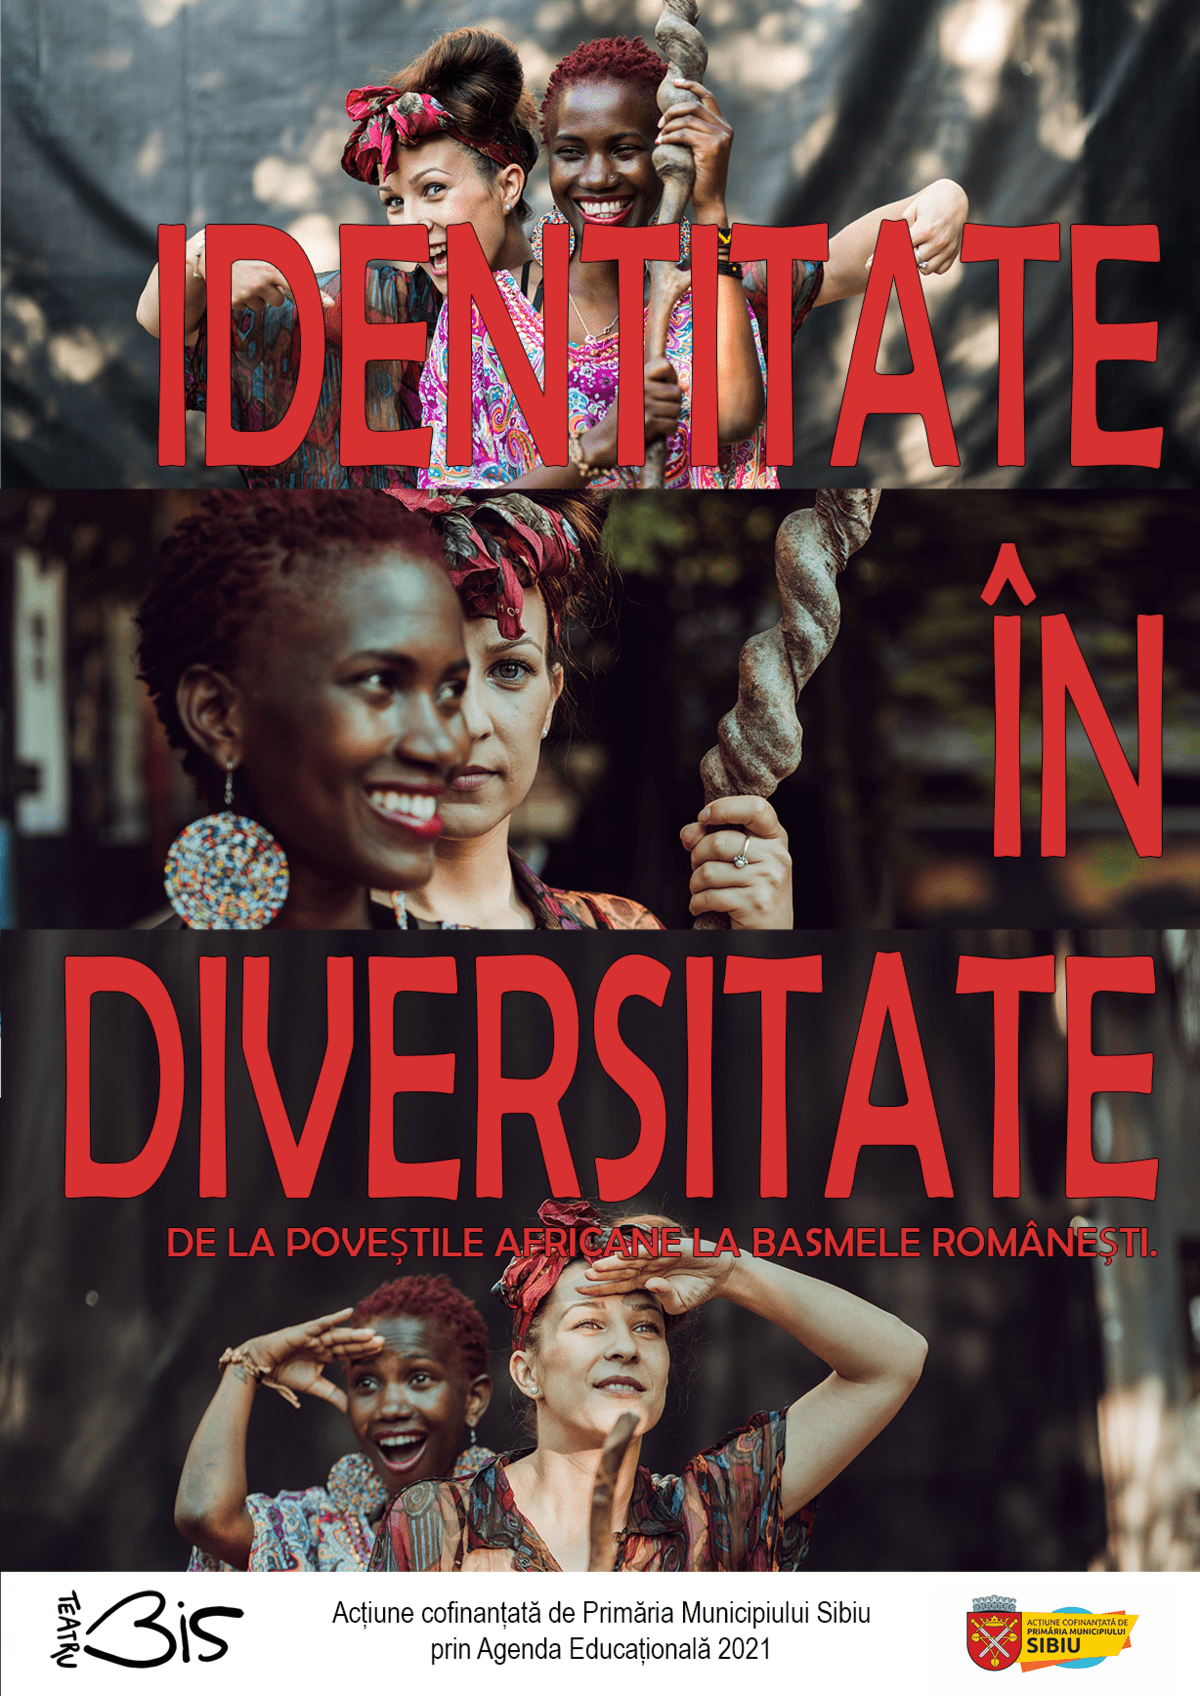 Identitate in diversitate